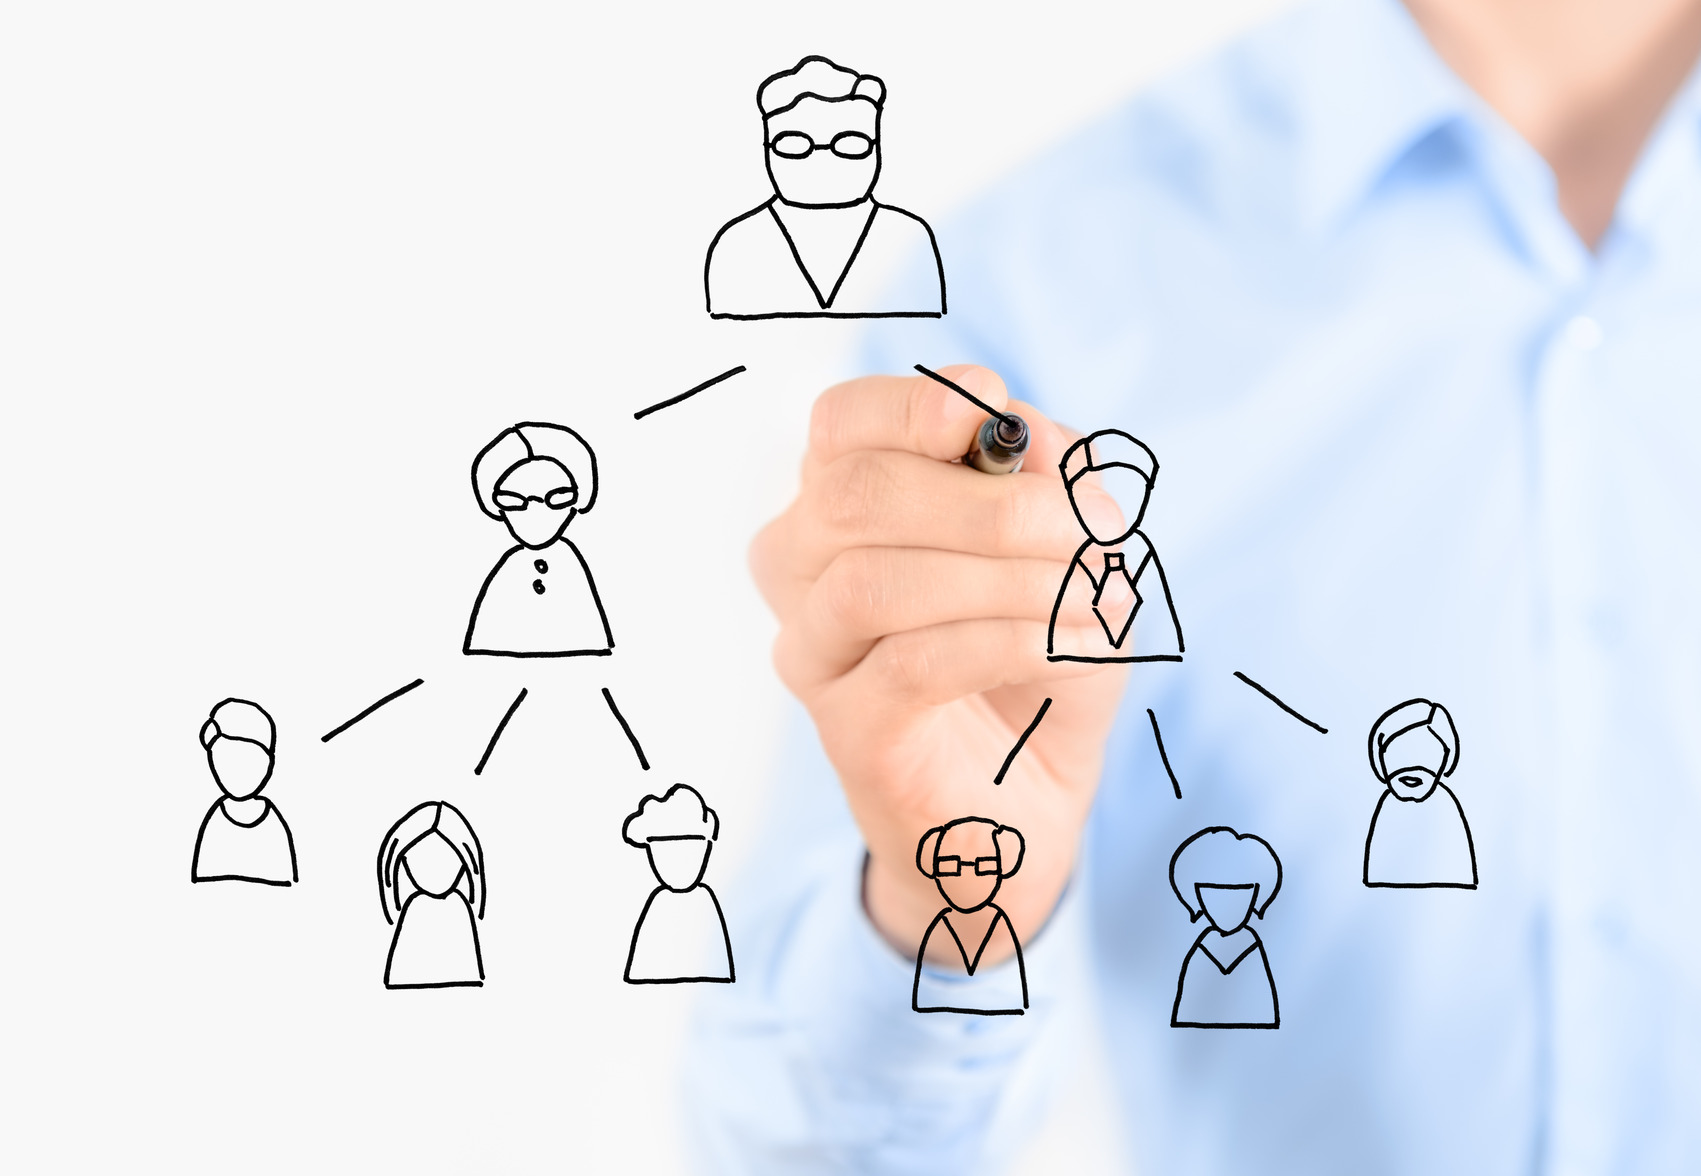 روش کار بازاریابی شبکه ای